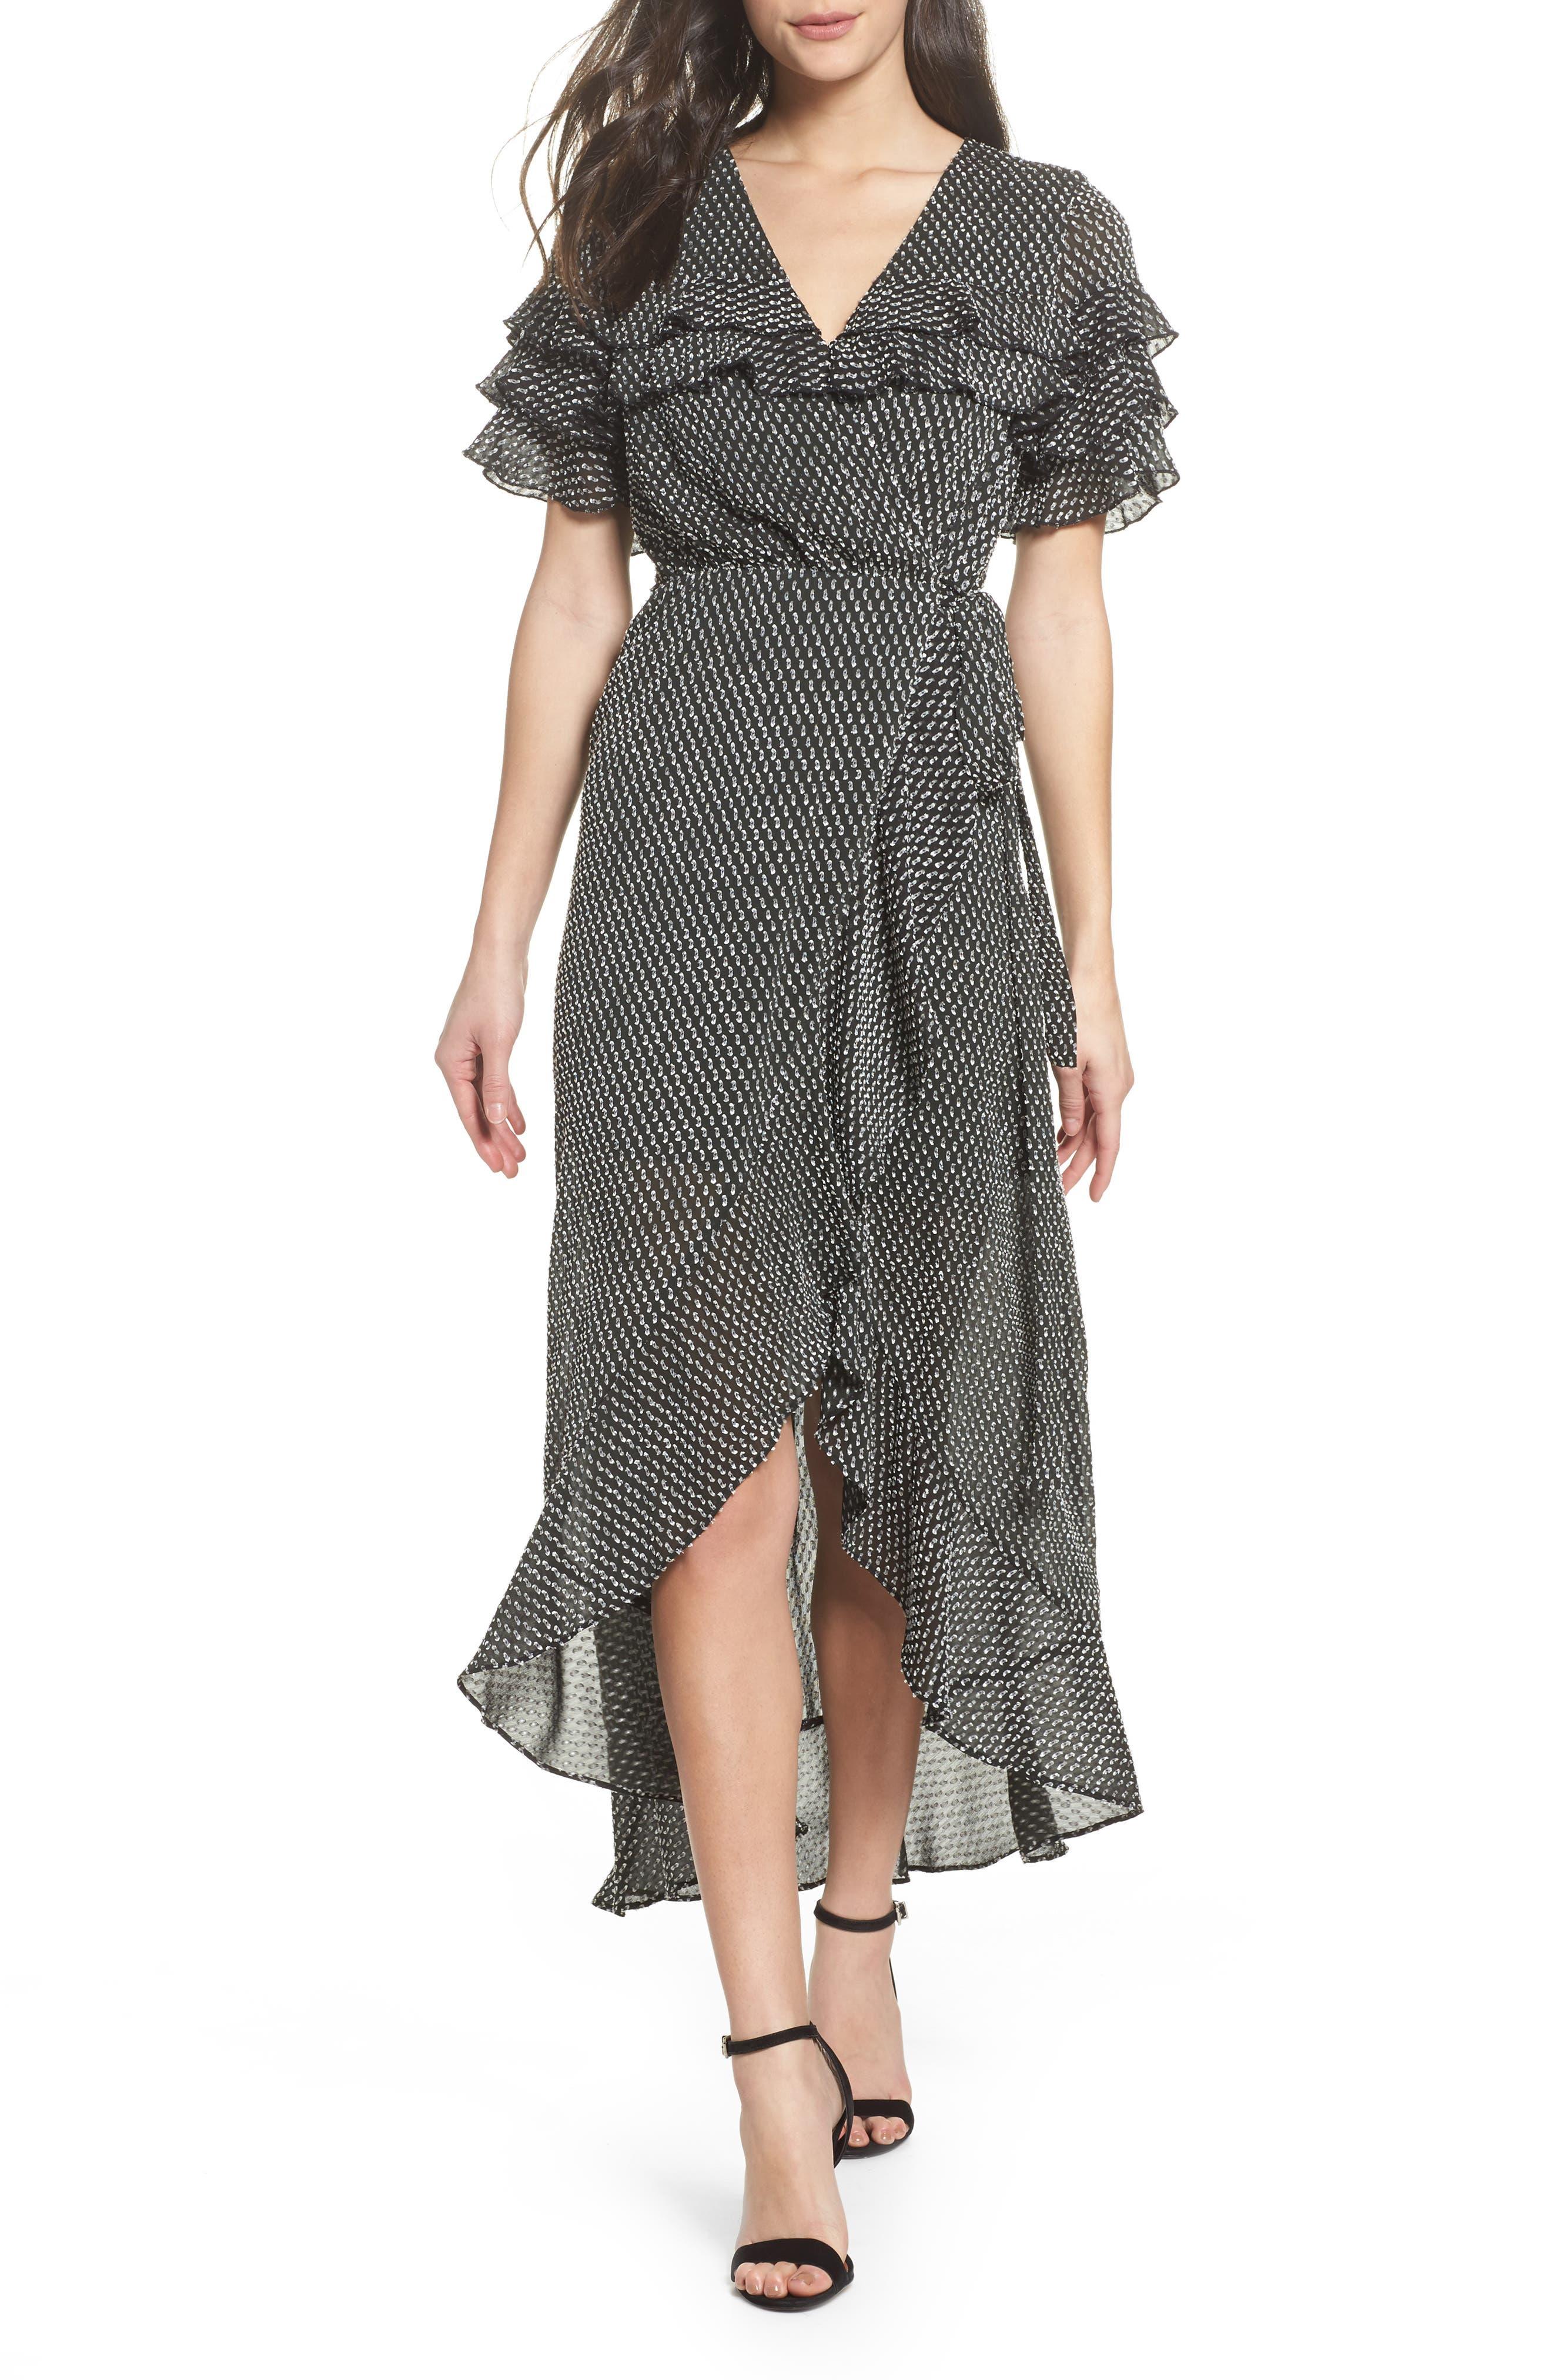 YOLO Ruffle Wrap Dress,                         Main,                         color, Black/ White Dot